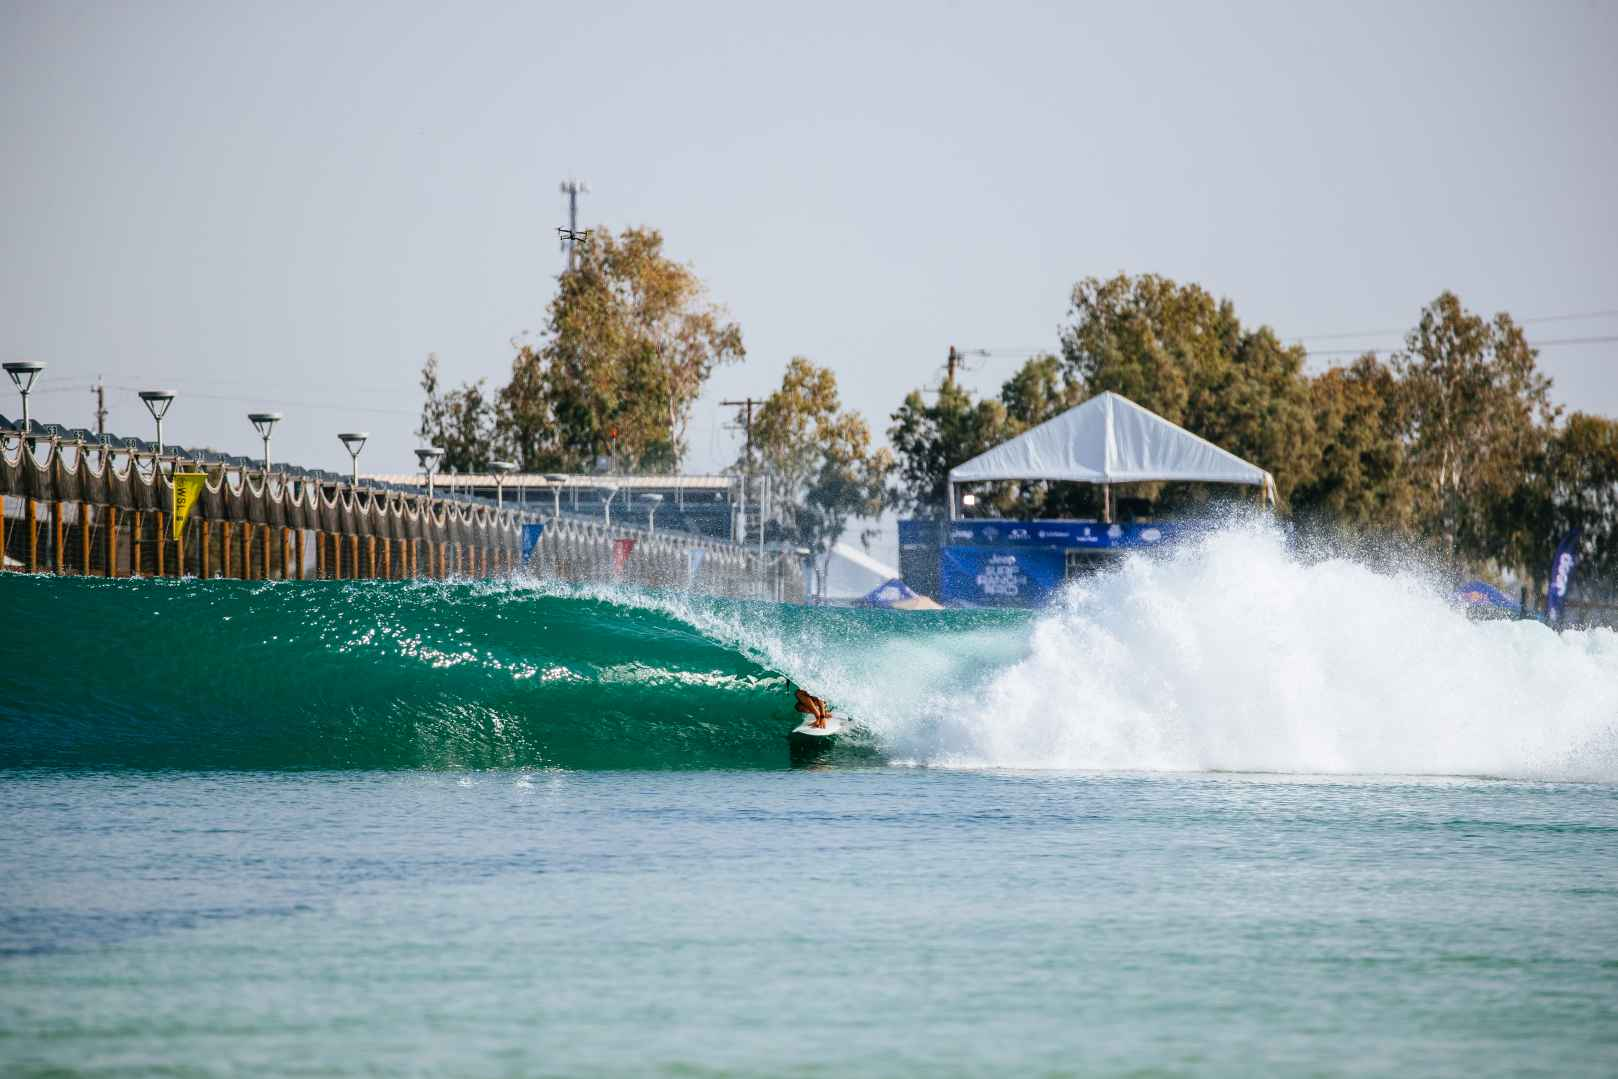 surf30 surf ranch pro 2021 wsl surf Manuel M Ranch21 THF3037